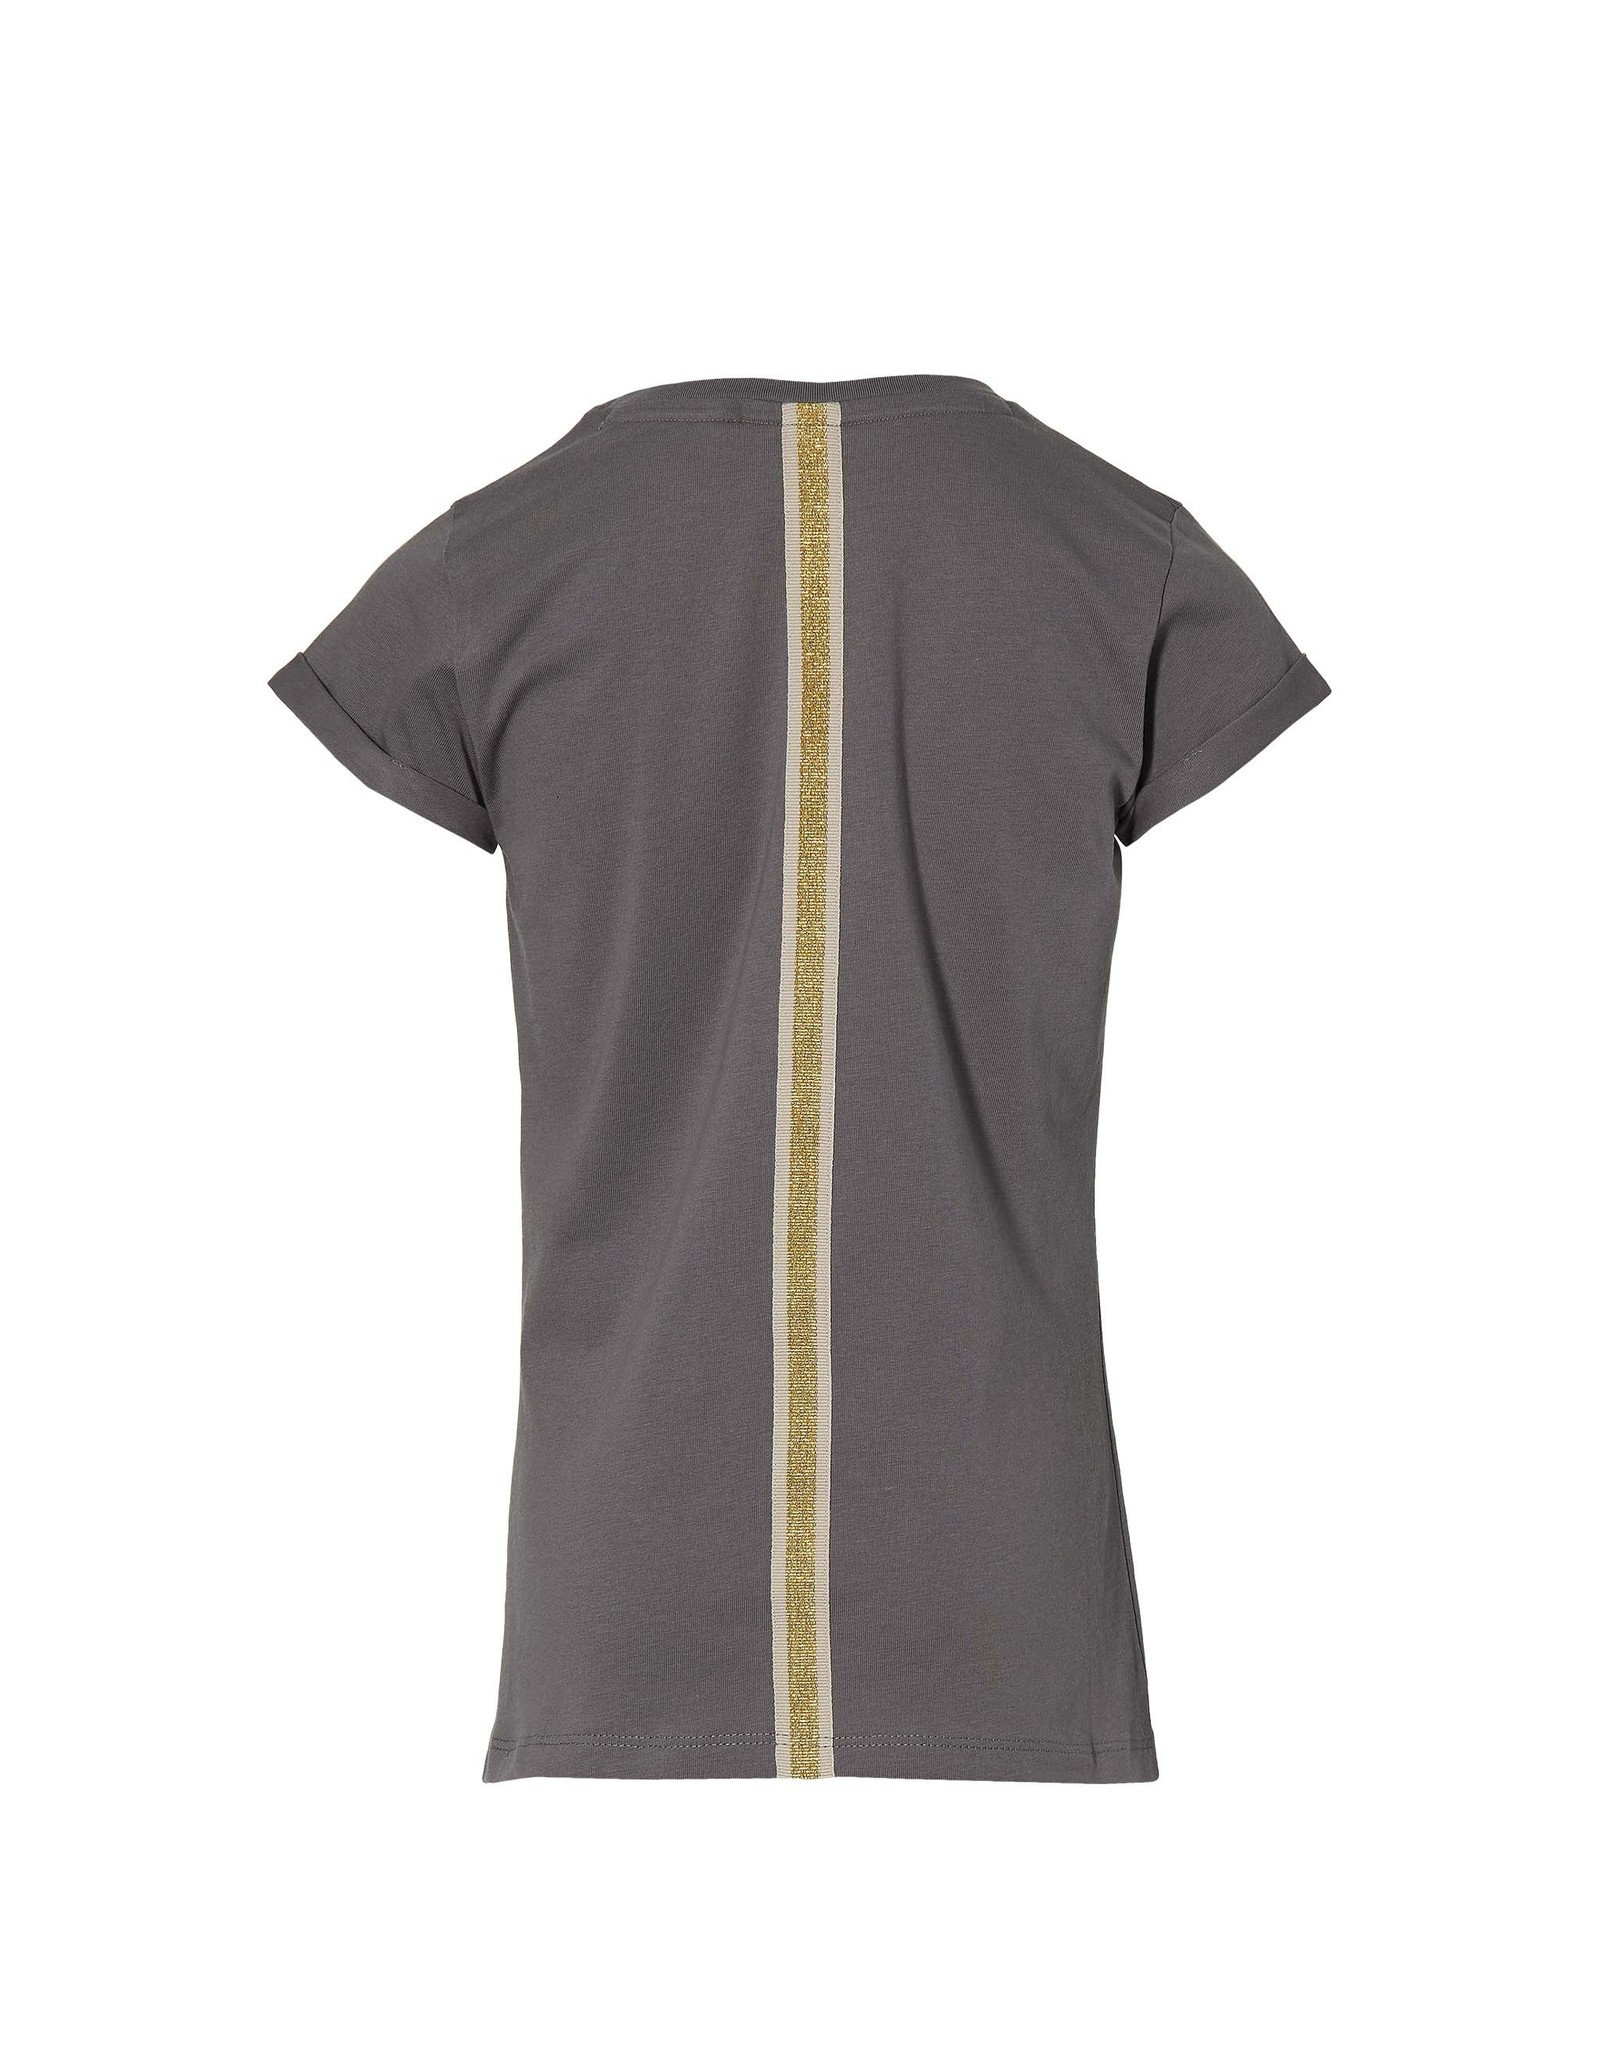 LEVV Levv meiden t-shirt Marita Steel Grey